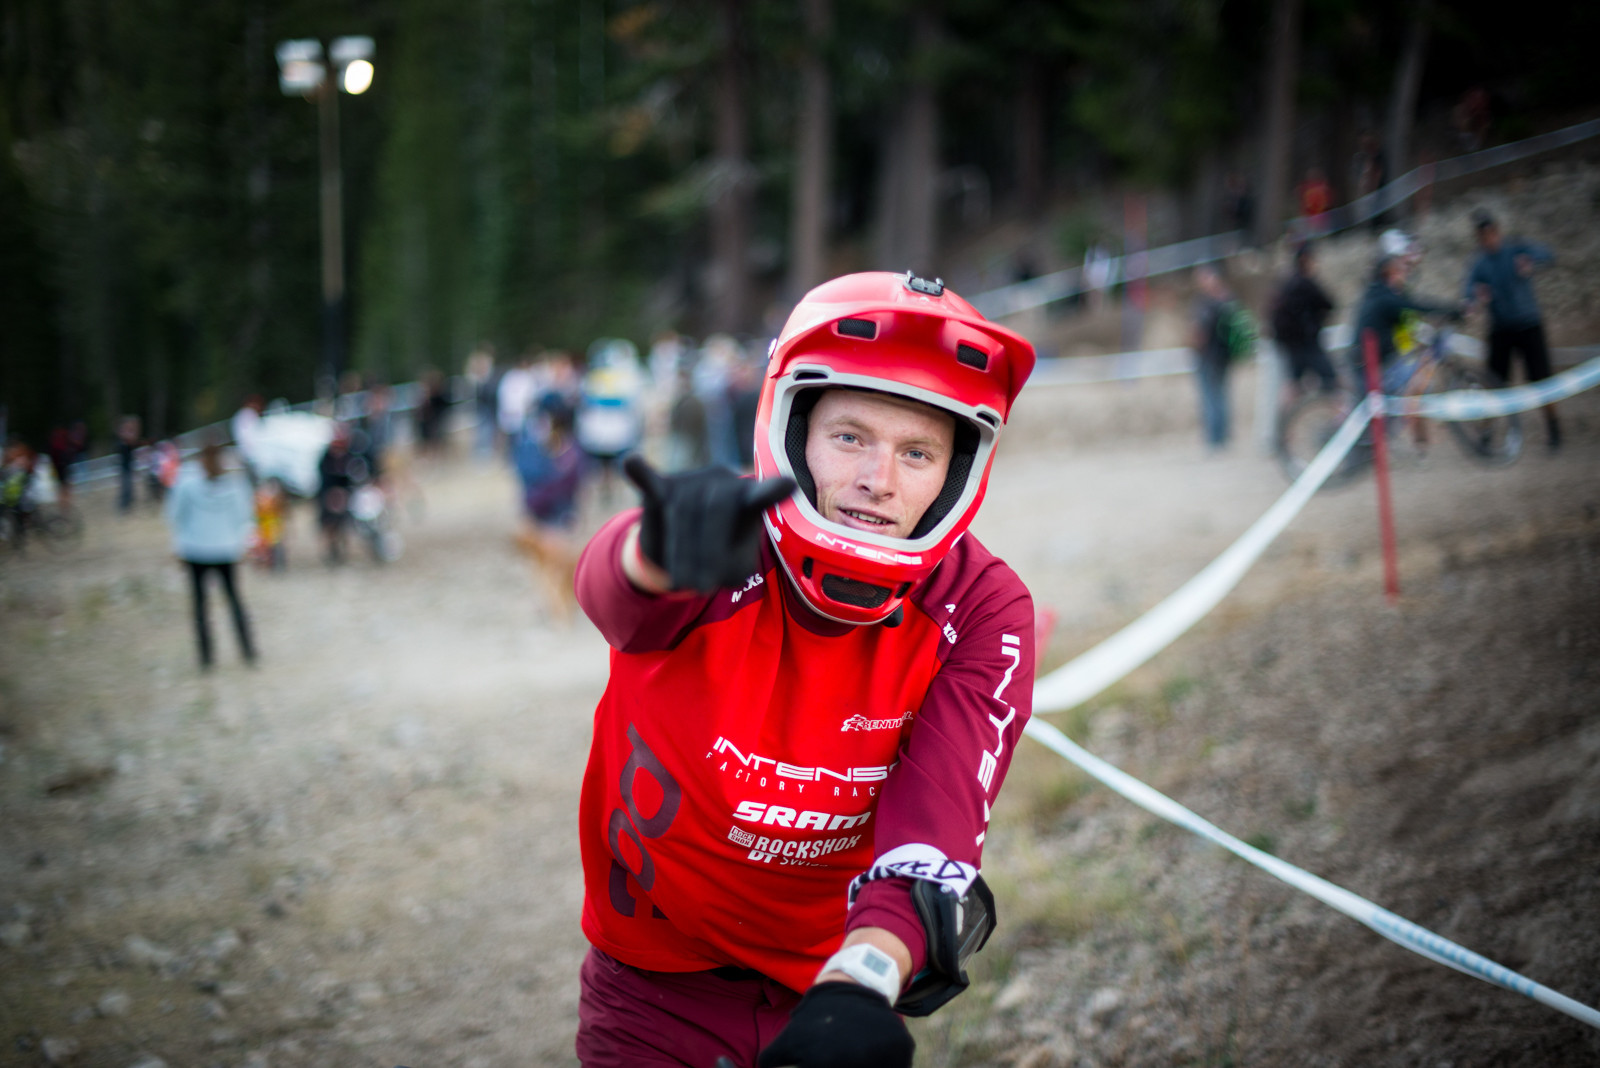 Luca Cometti - Mammoth Mountain Kamikaze Bike Games Dual Slalom - Mountain Biking Pictures - Vital MTB